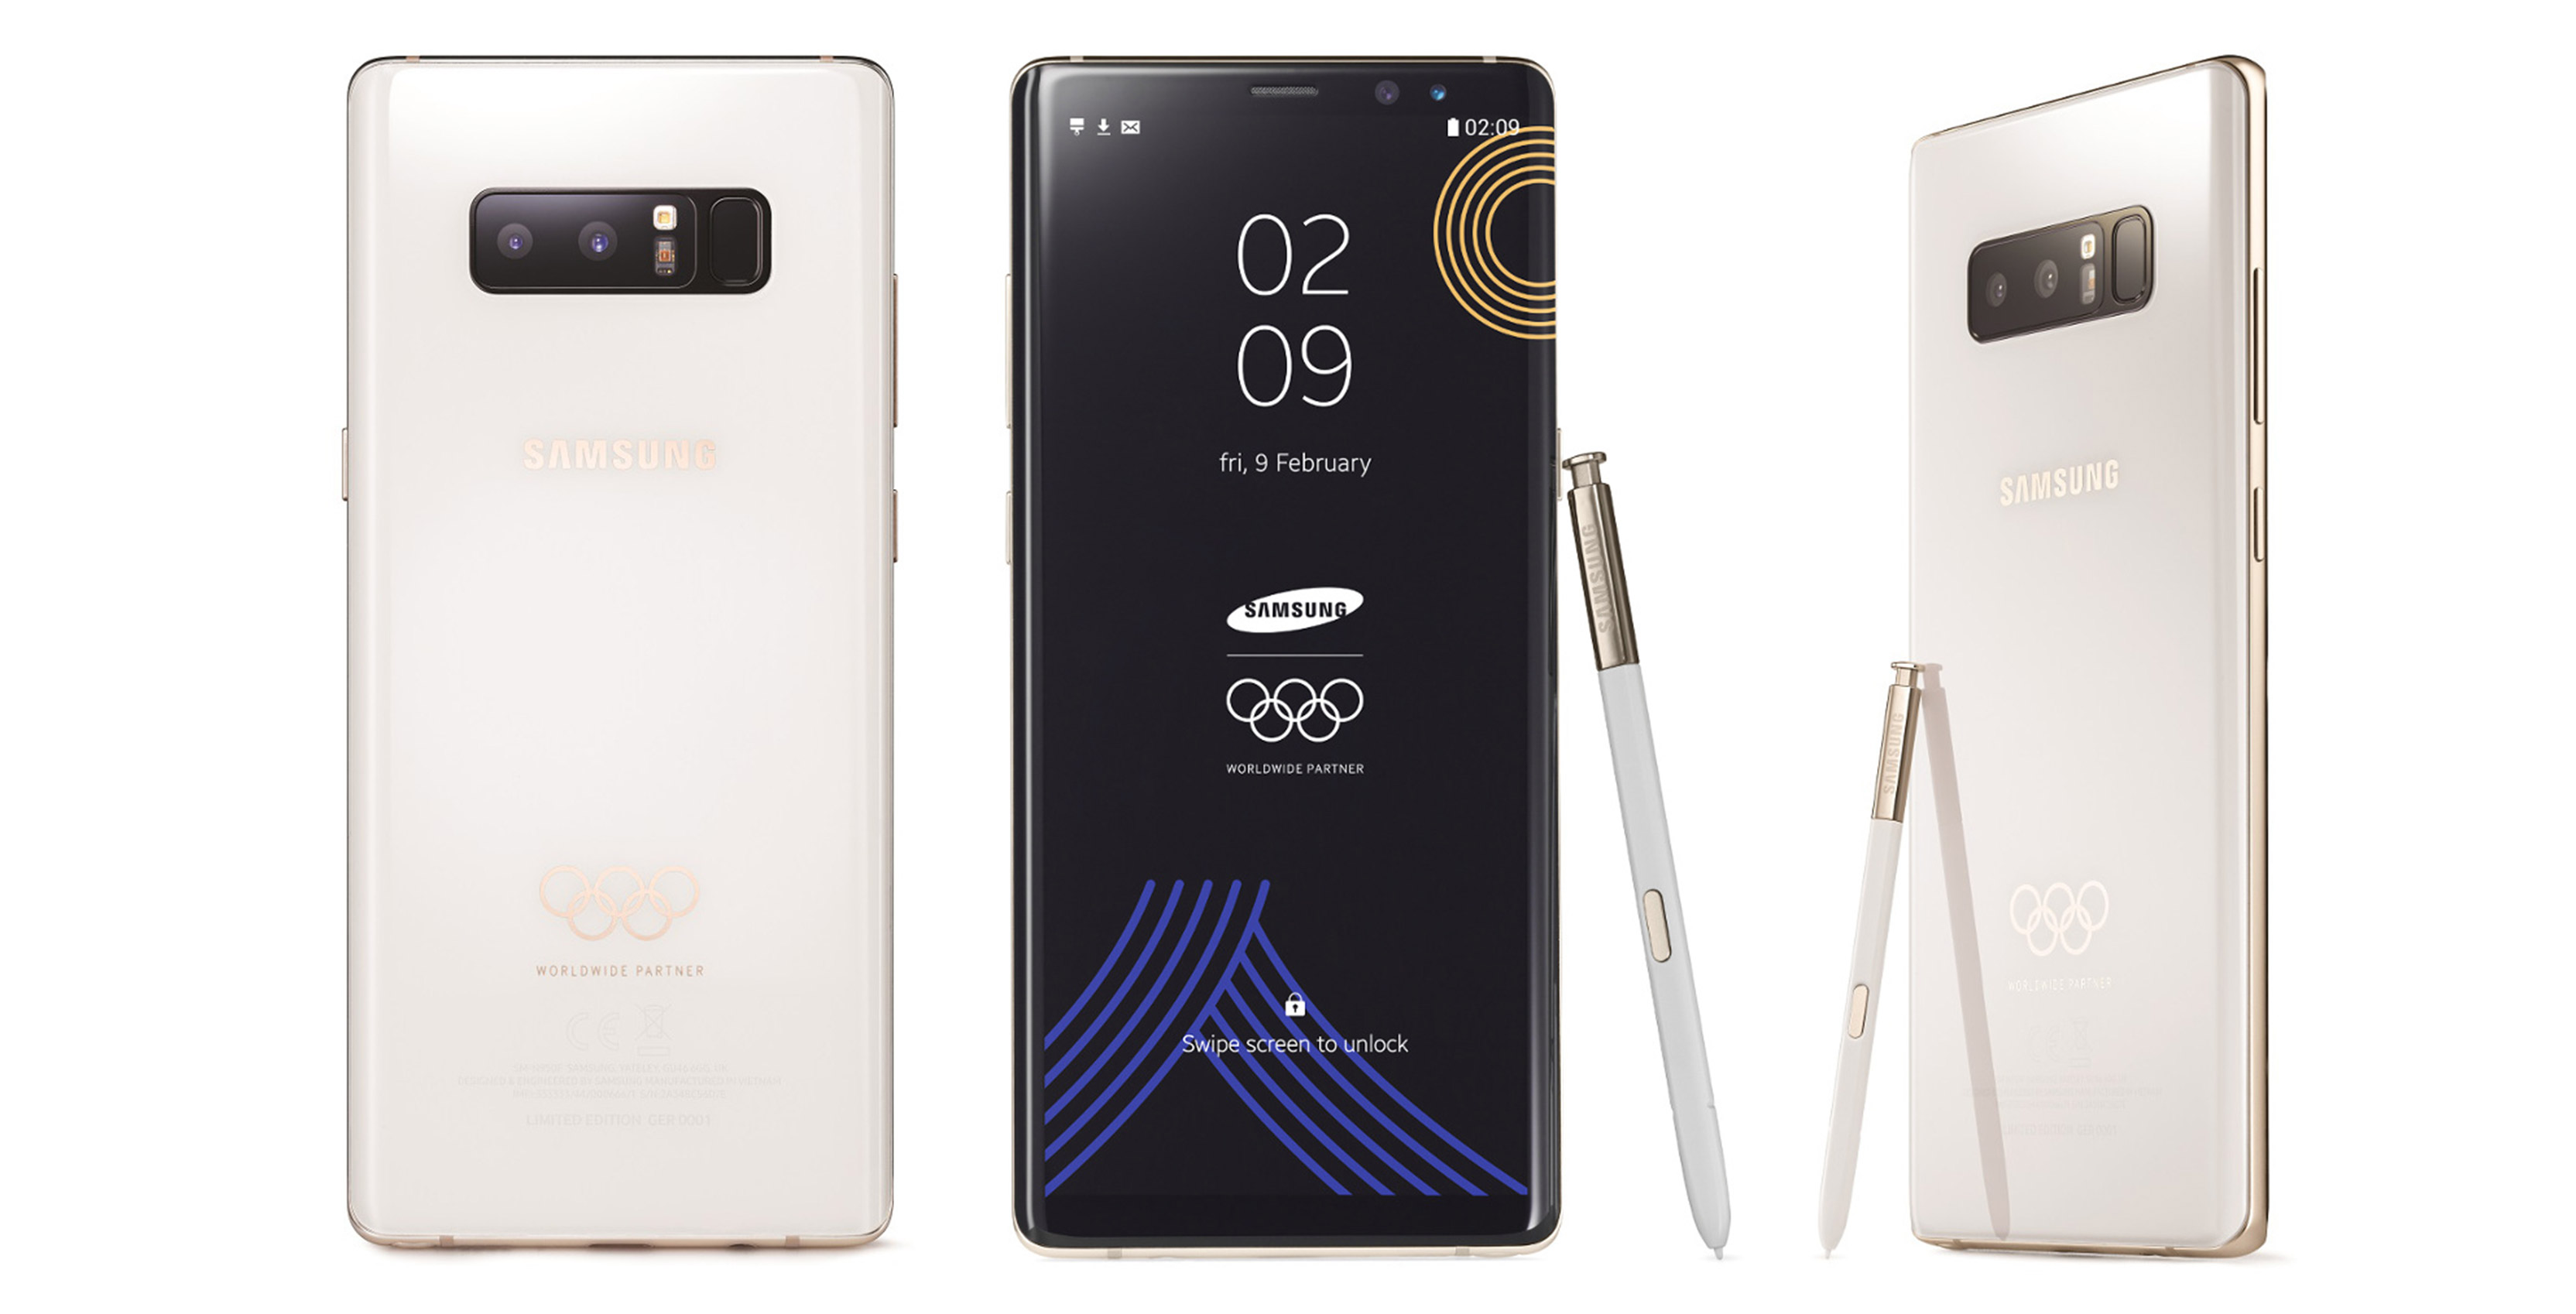 White Samsung Note 8